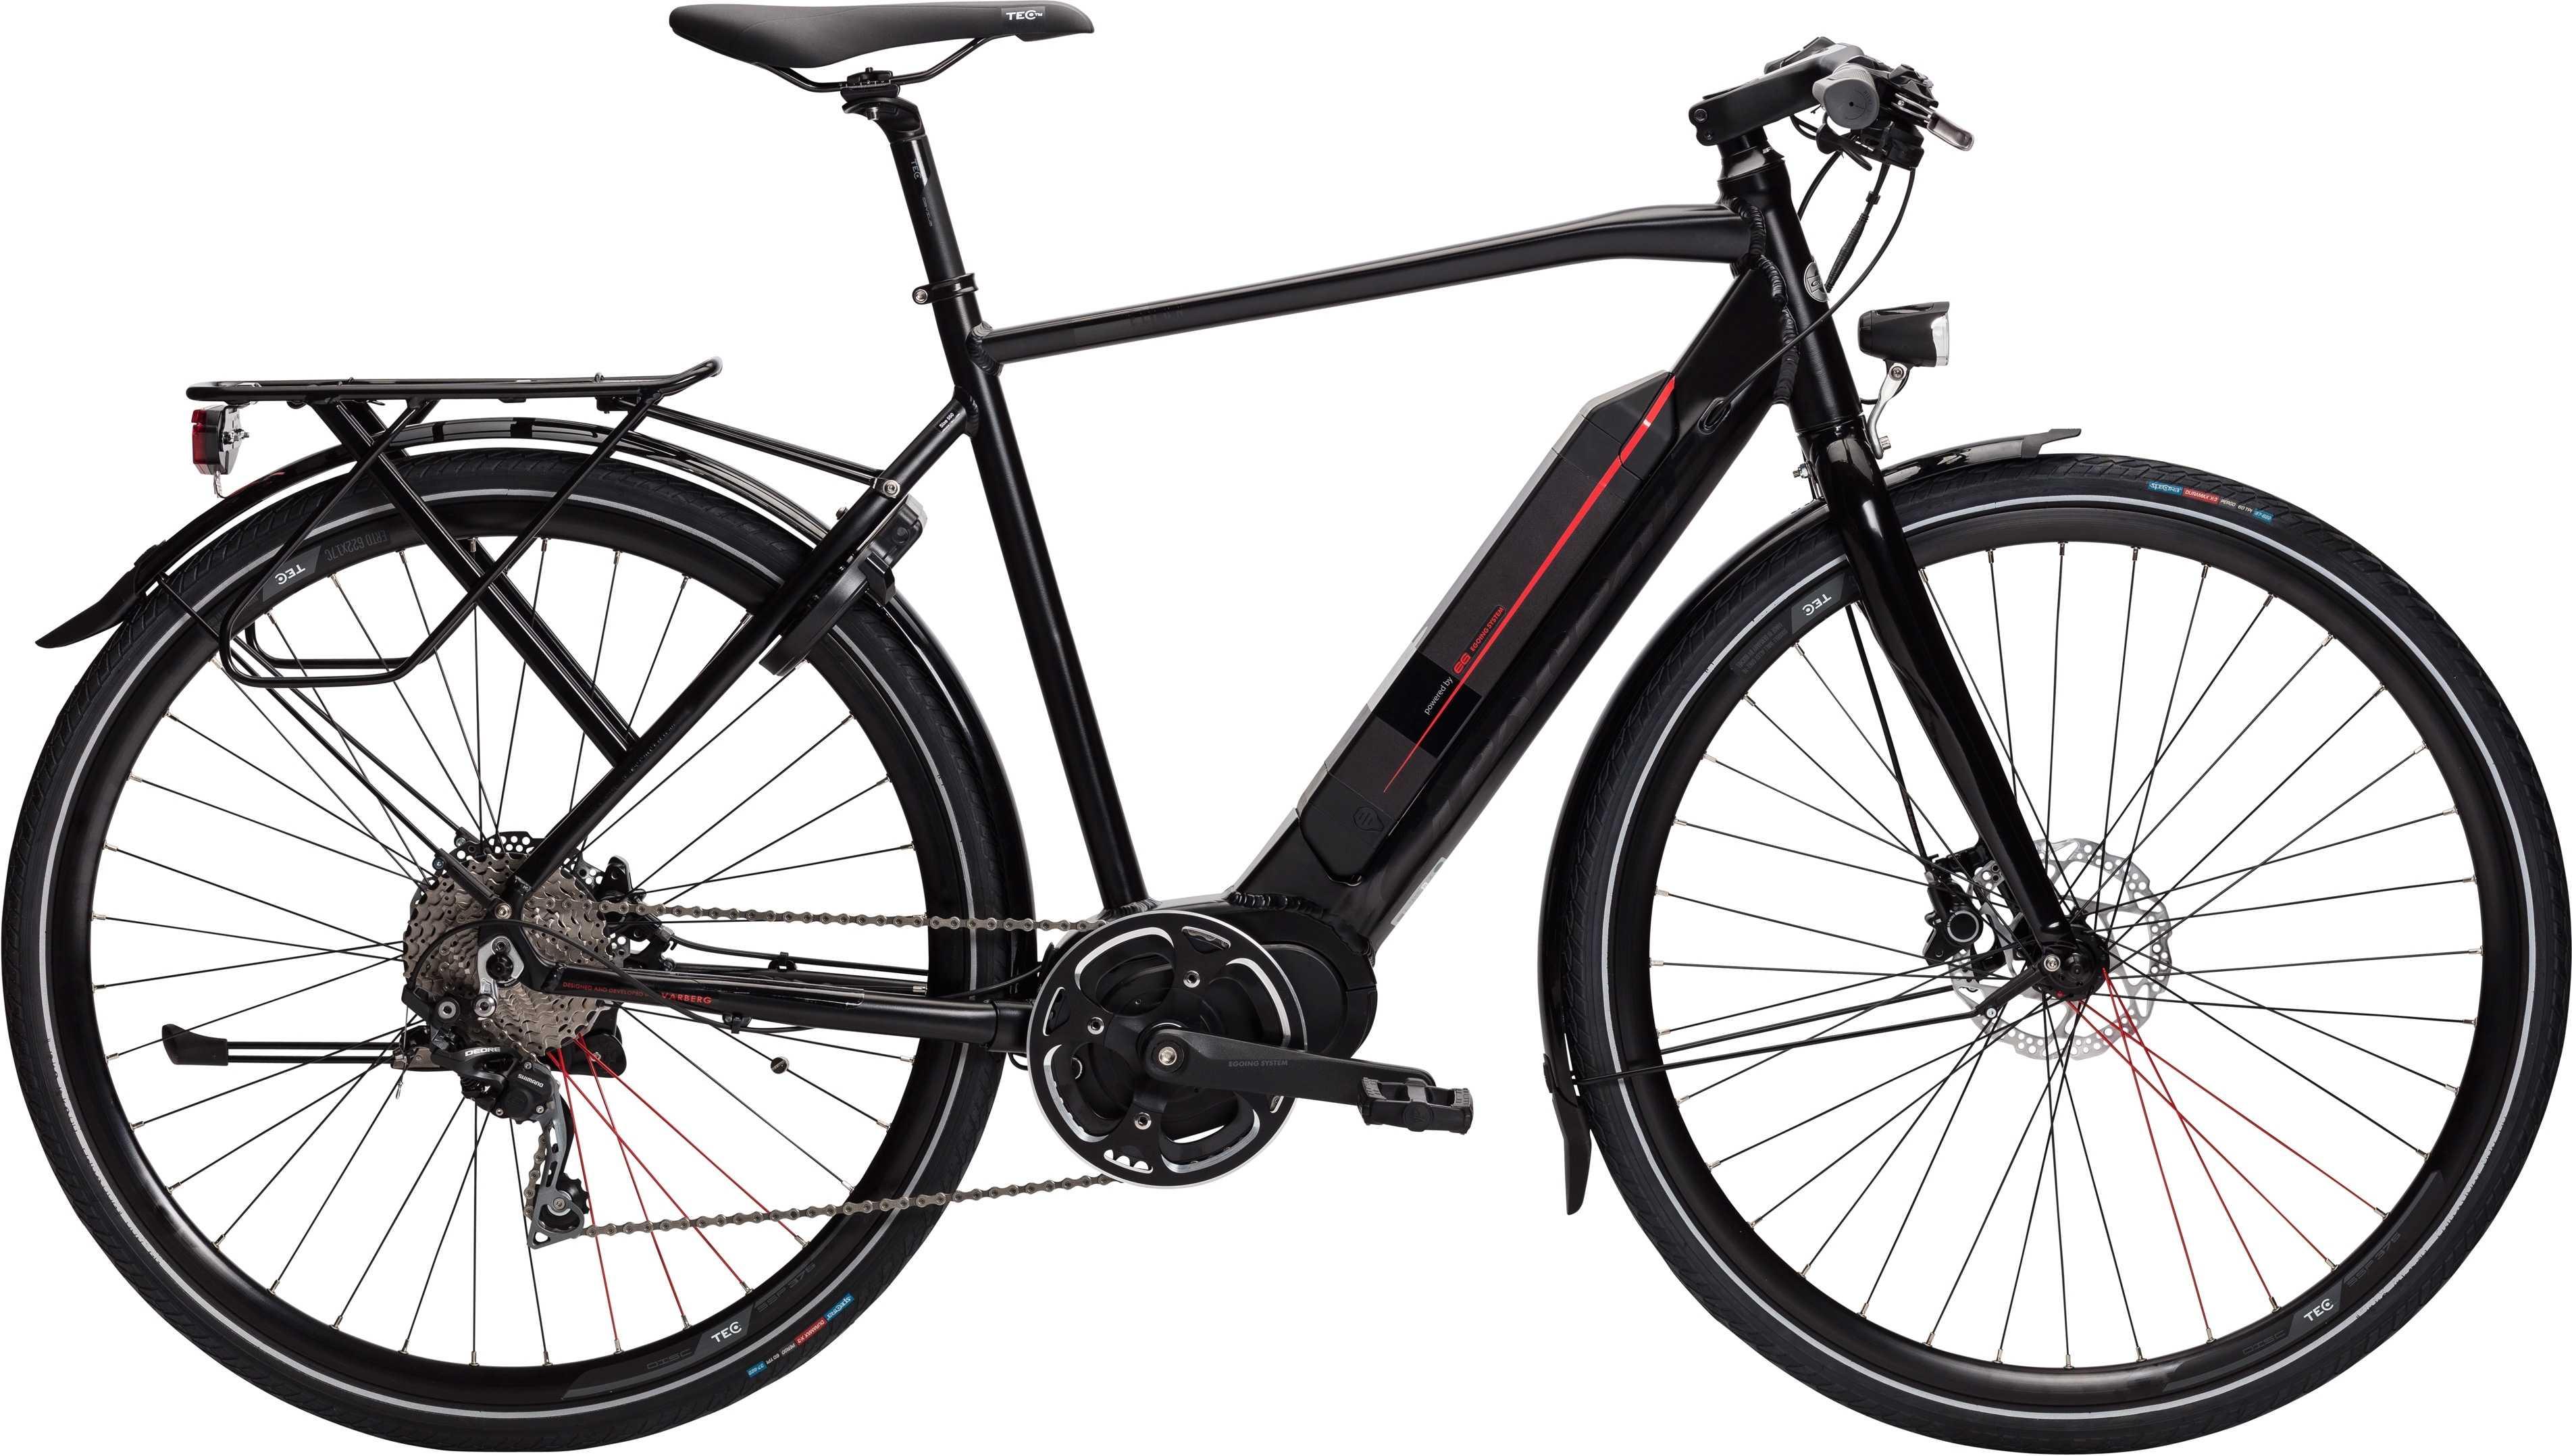 CRESCENT ELTON MATSORT | City-cykler